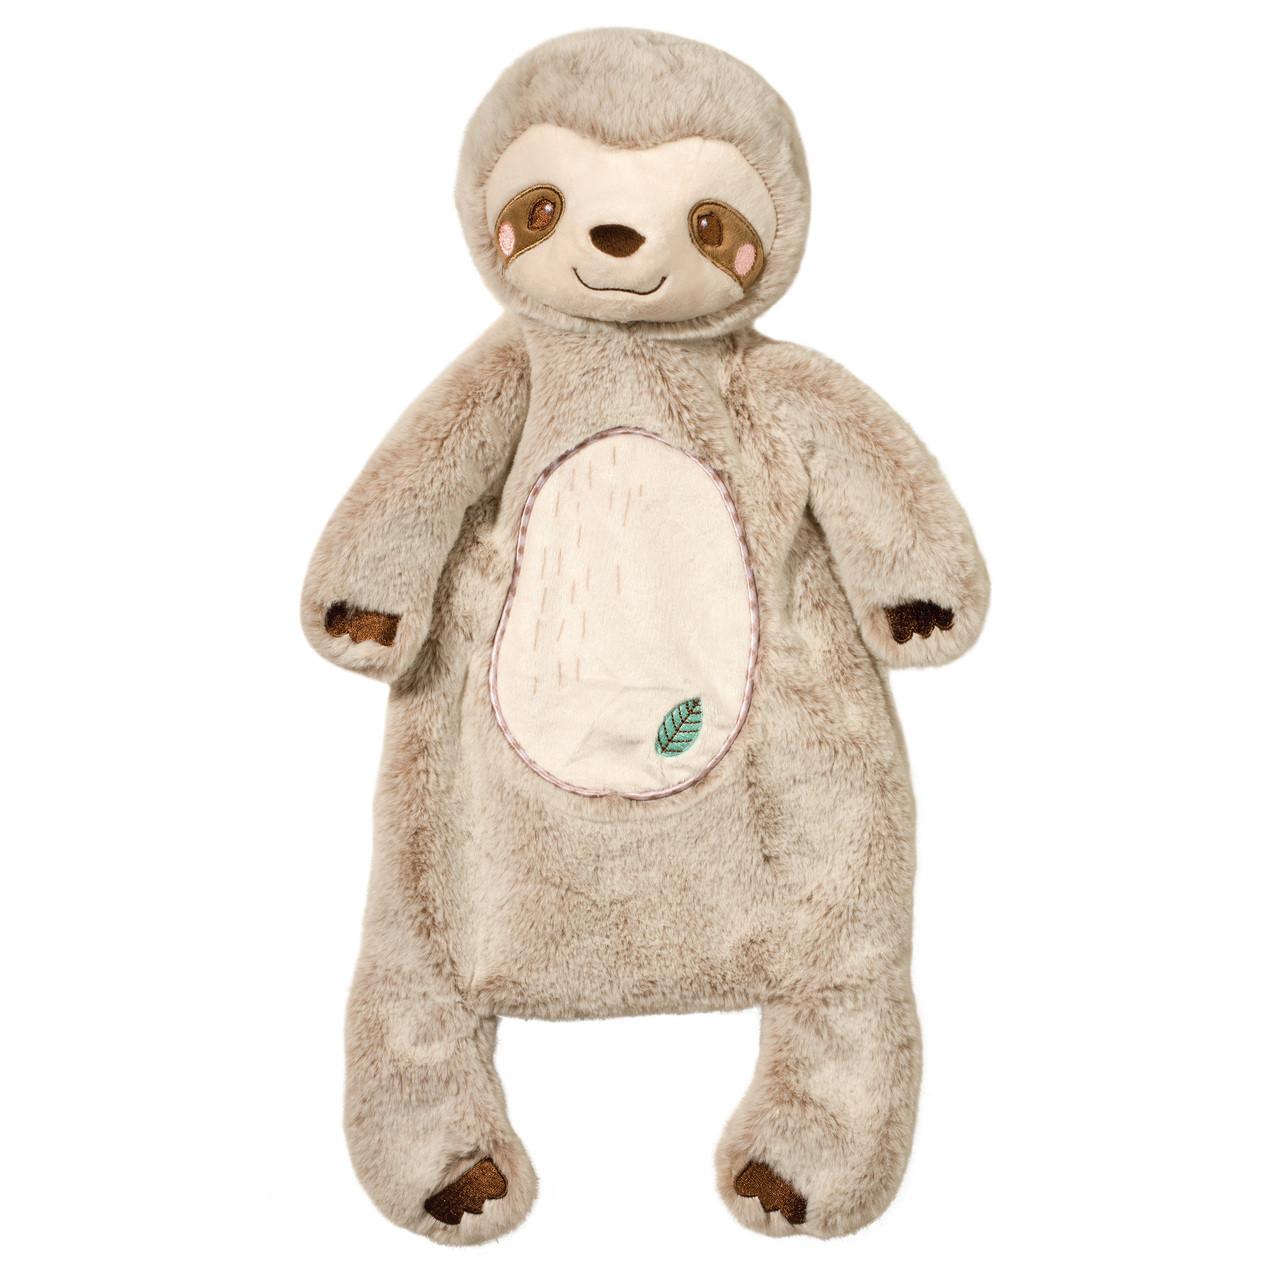 Sloth Schlumpie Blanket Baby Blanket Stuffed Animal Gift For